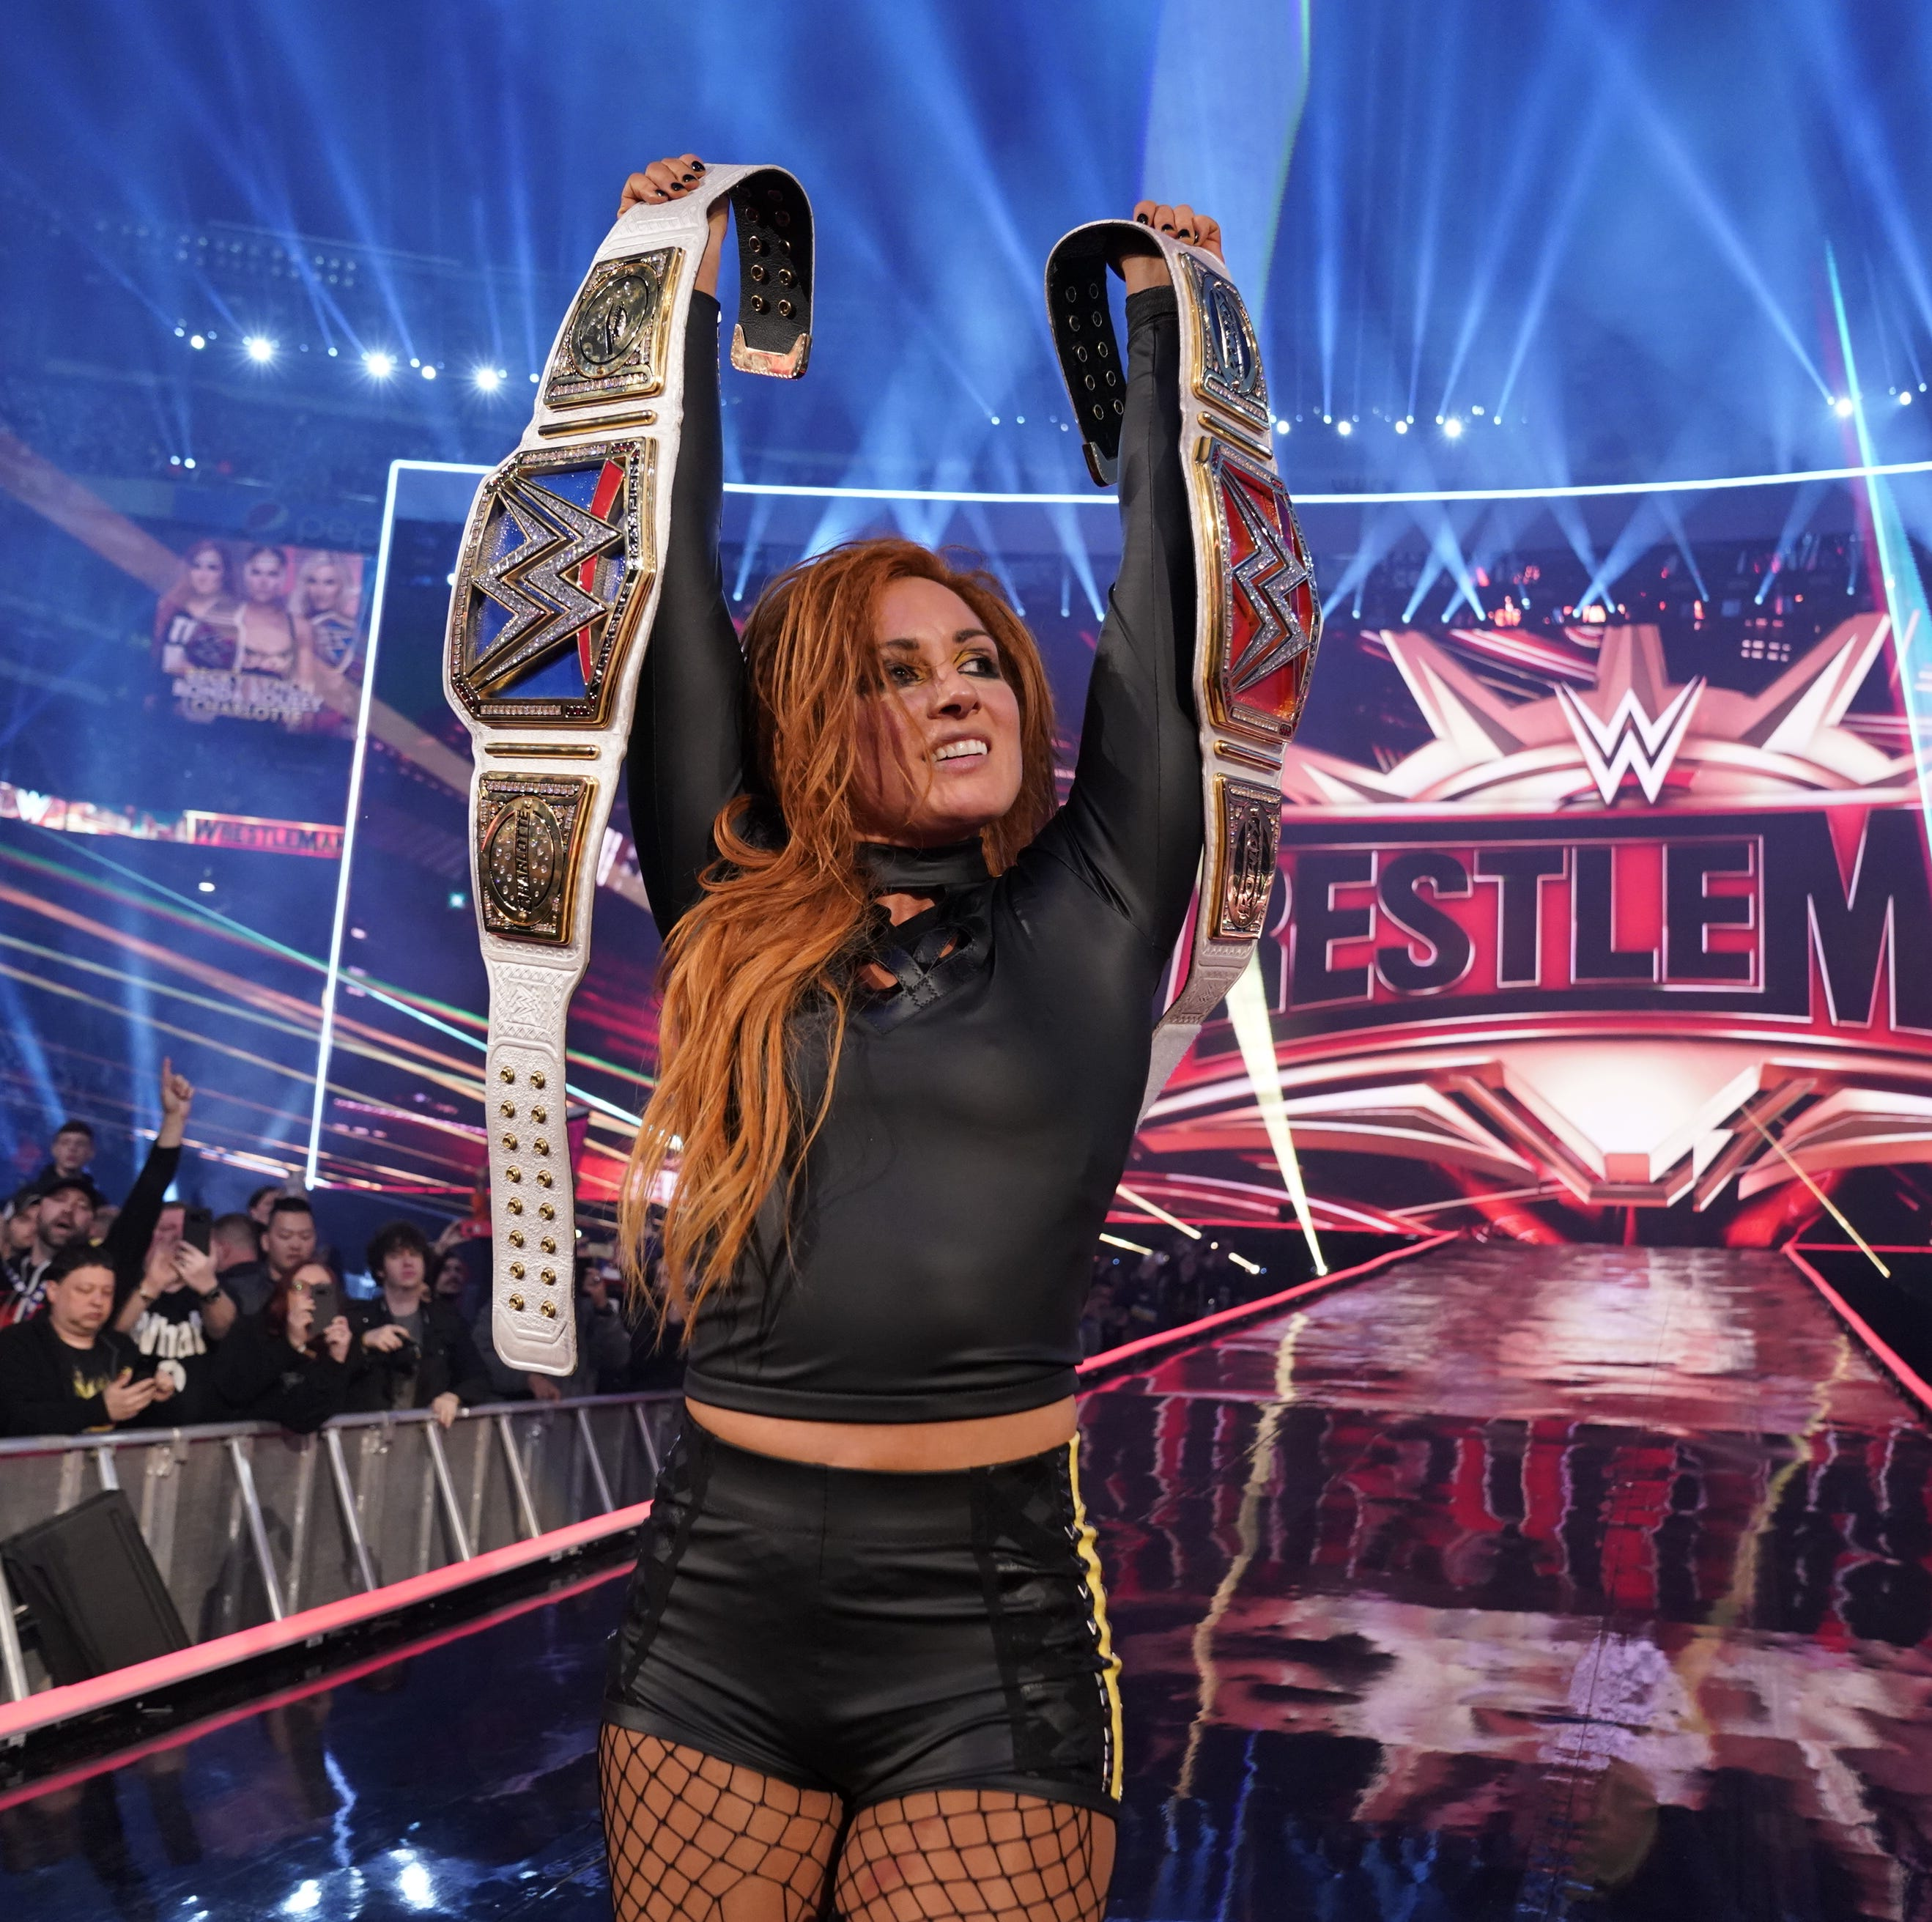 WrestleMania 35: Becky Lynch, Kofi Kingston win championships at MetLife Stadium spectacle